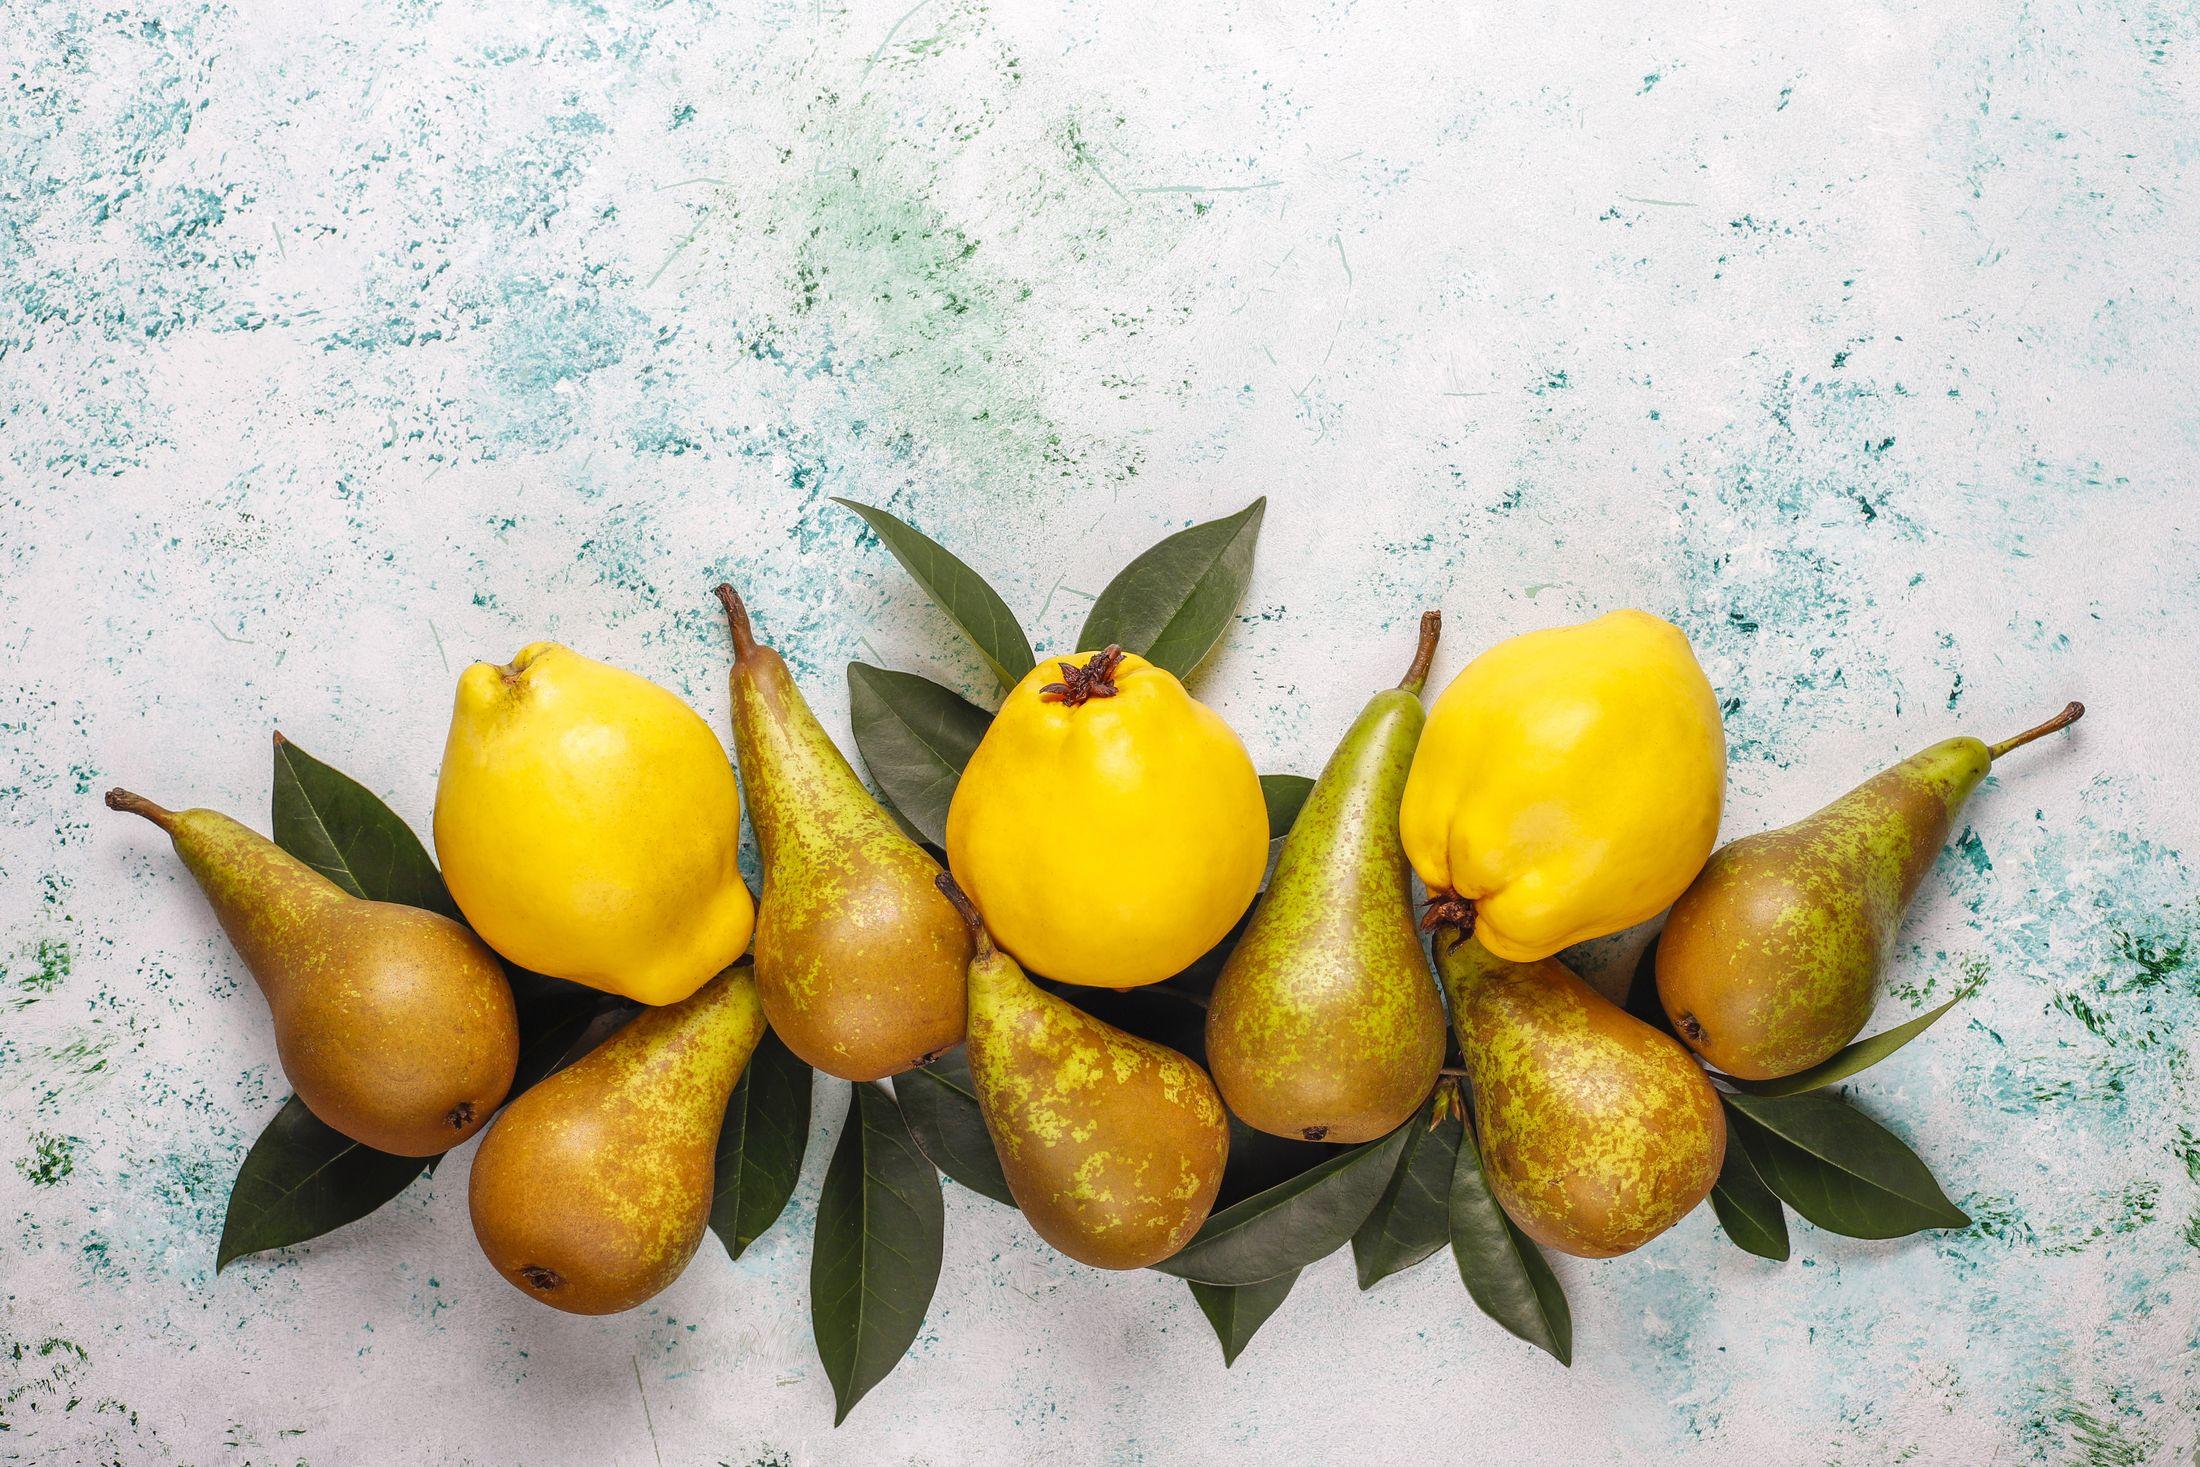 Fresh organic farm fruits,pears,quince,top view